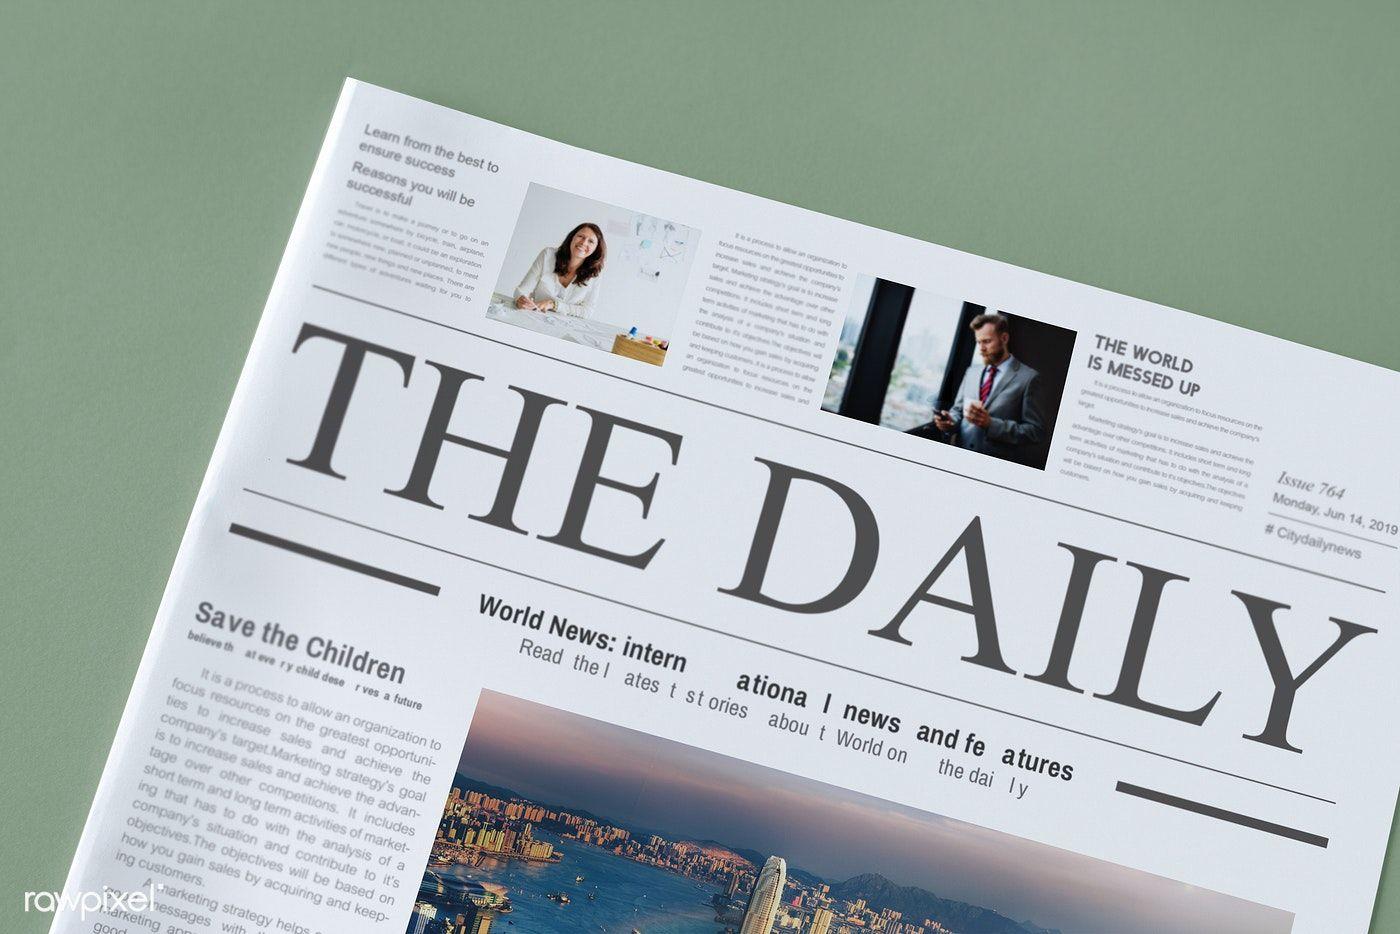 The Daily News Newspaper Mockup Free Image By Rawpixel Com Ake